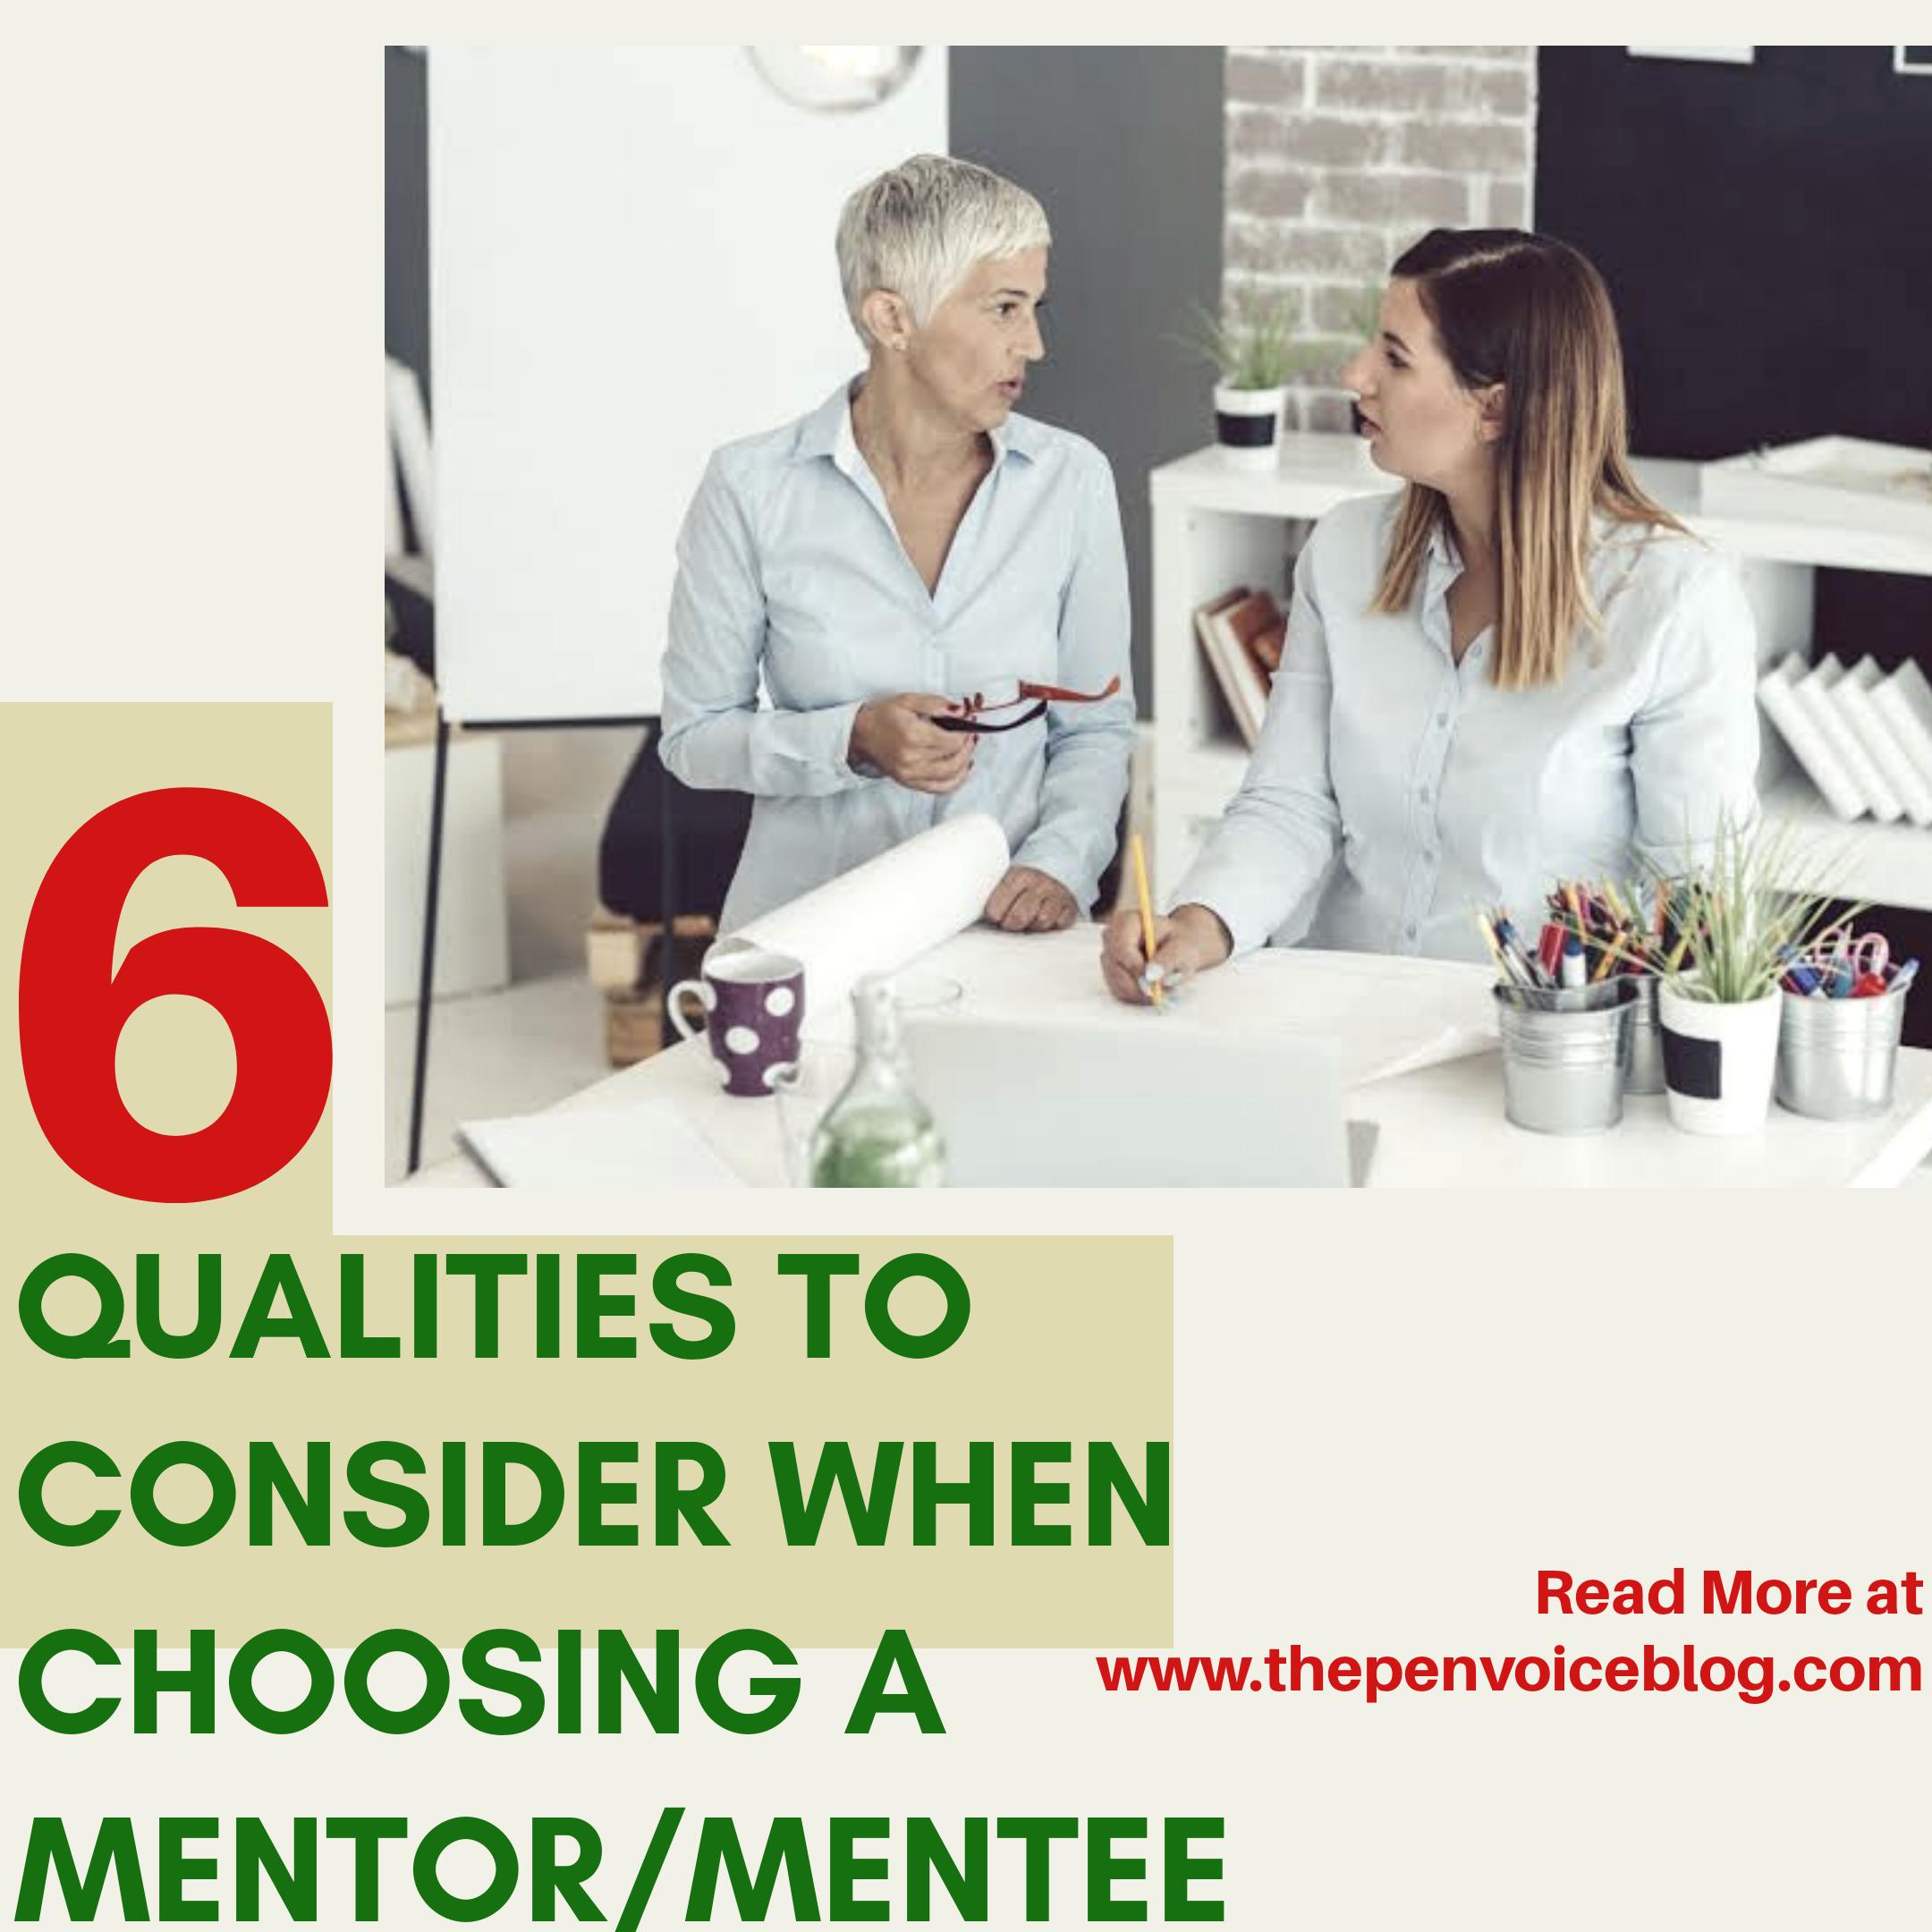 6 Qualities to Consider When Choosing a Mentor/Mentee